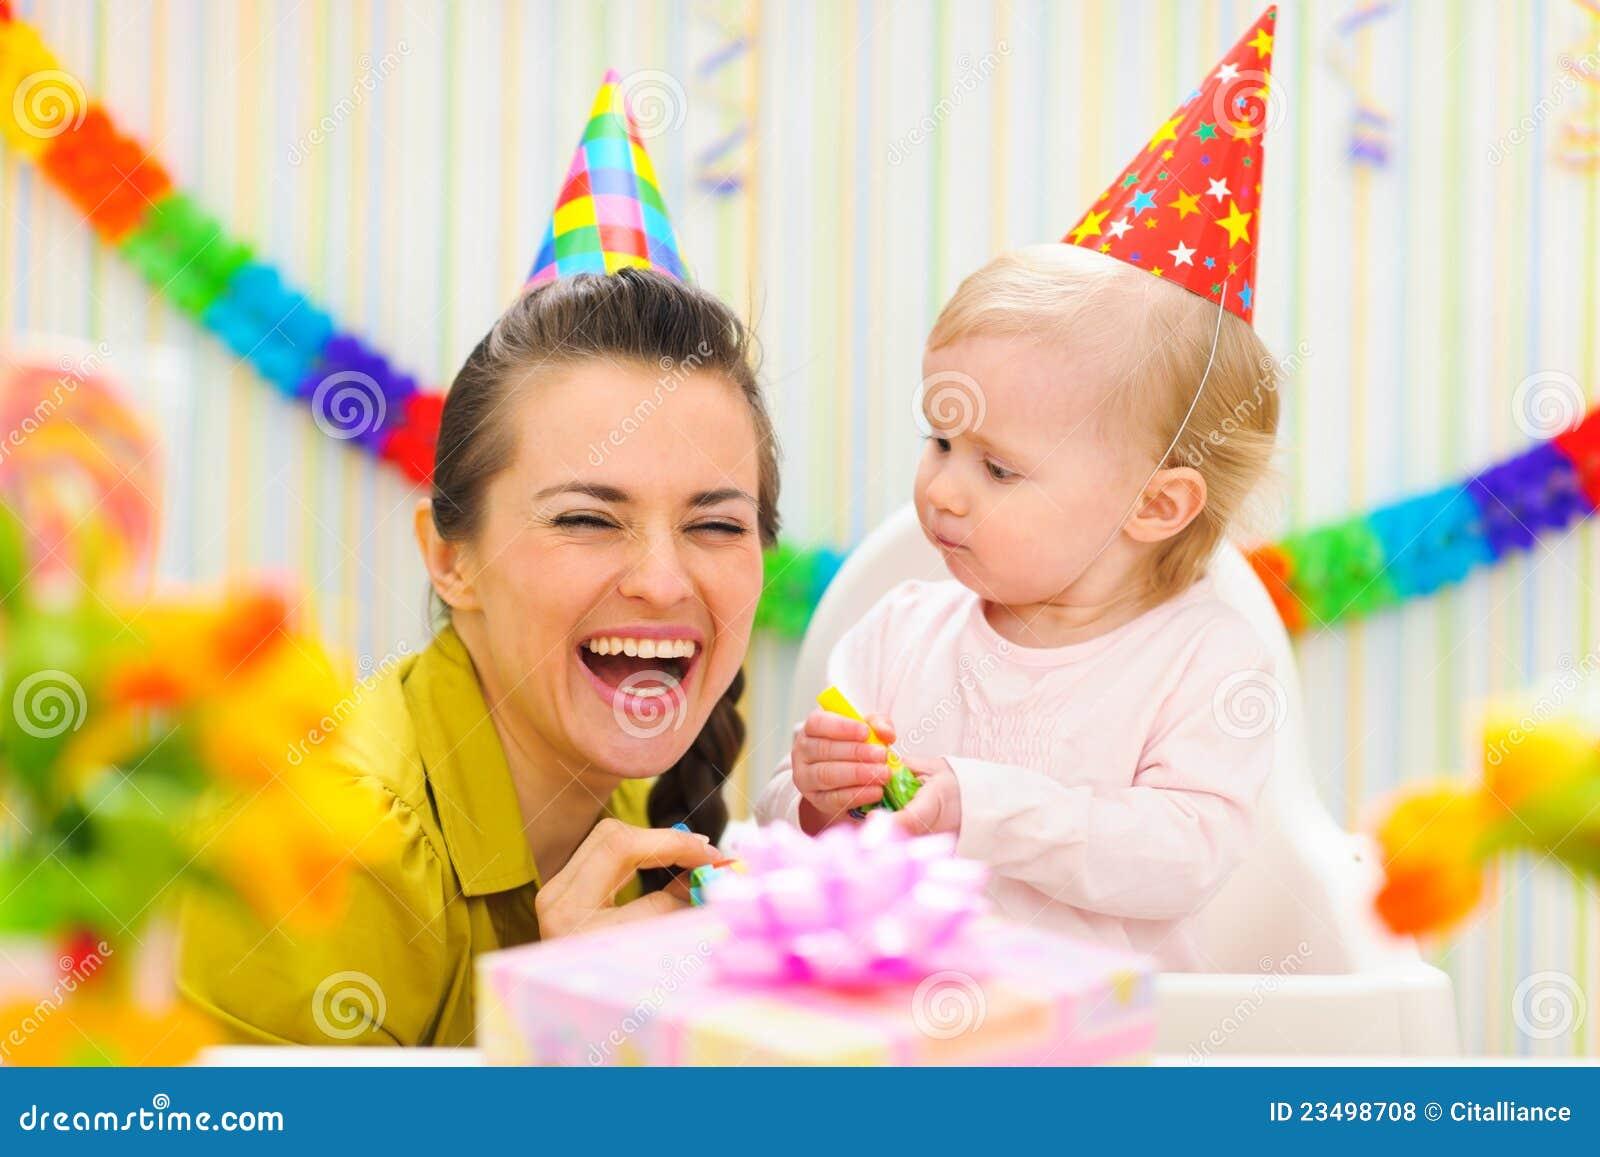 Ребенок с подарком 1 год